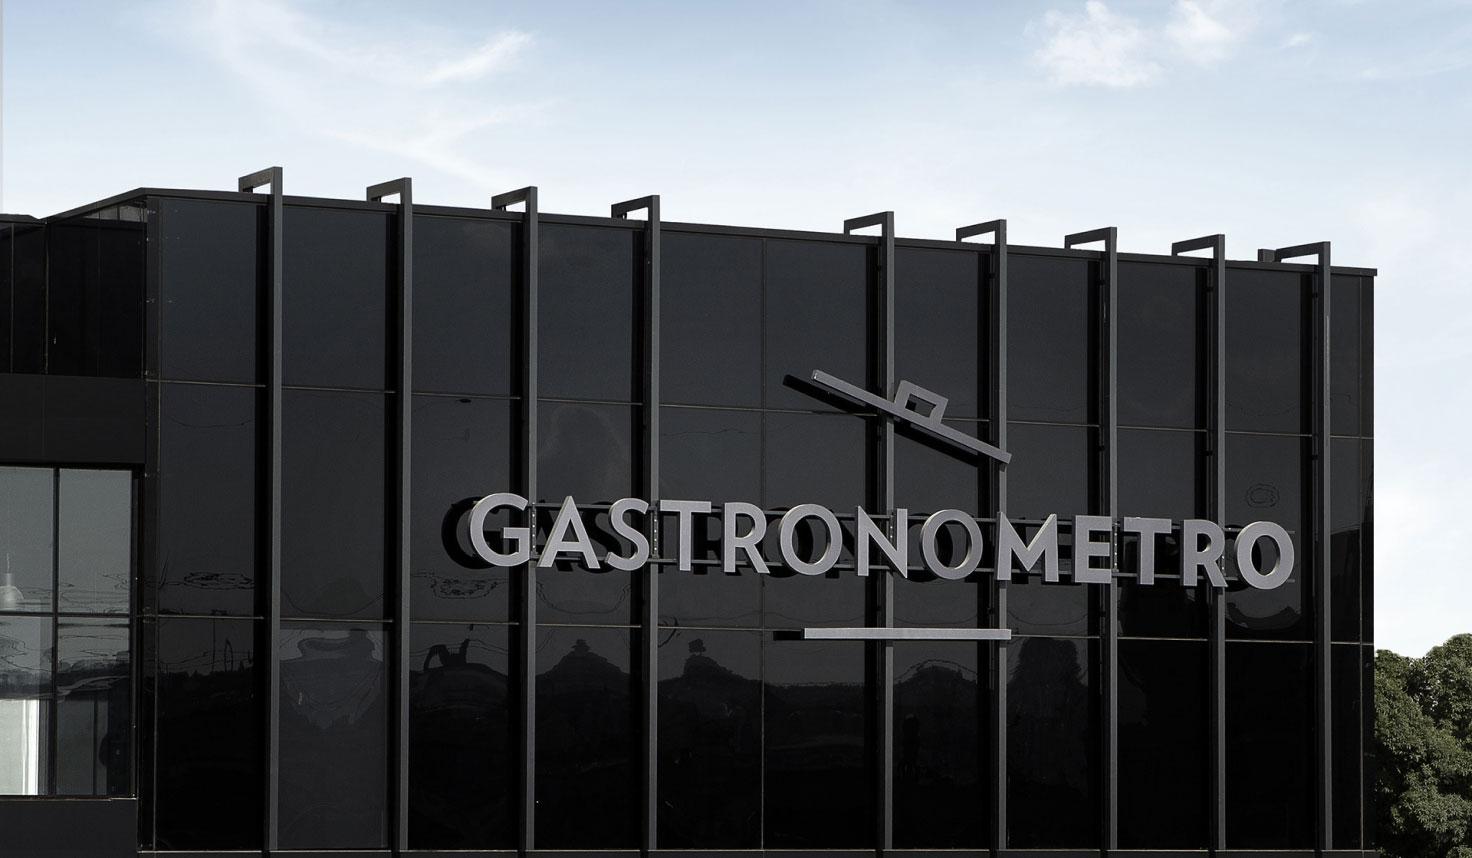 Gastronometro